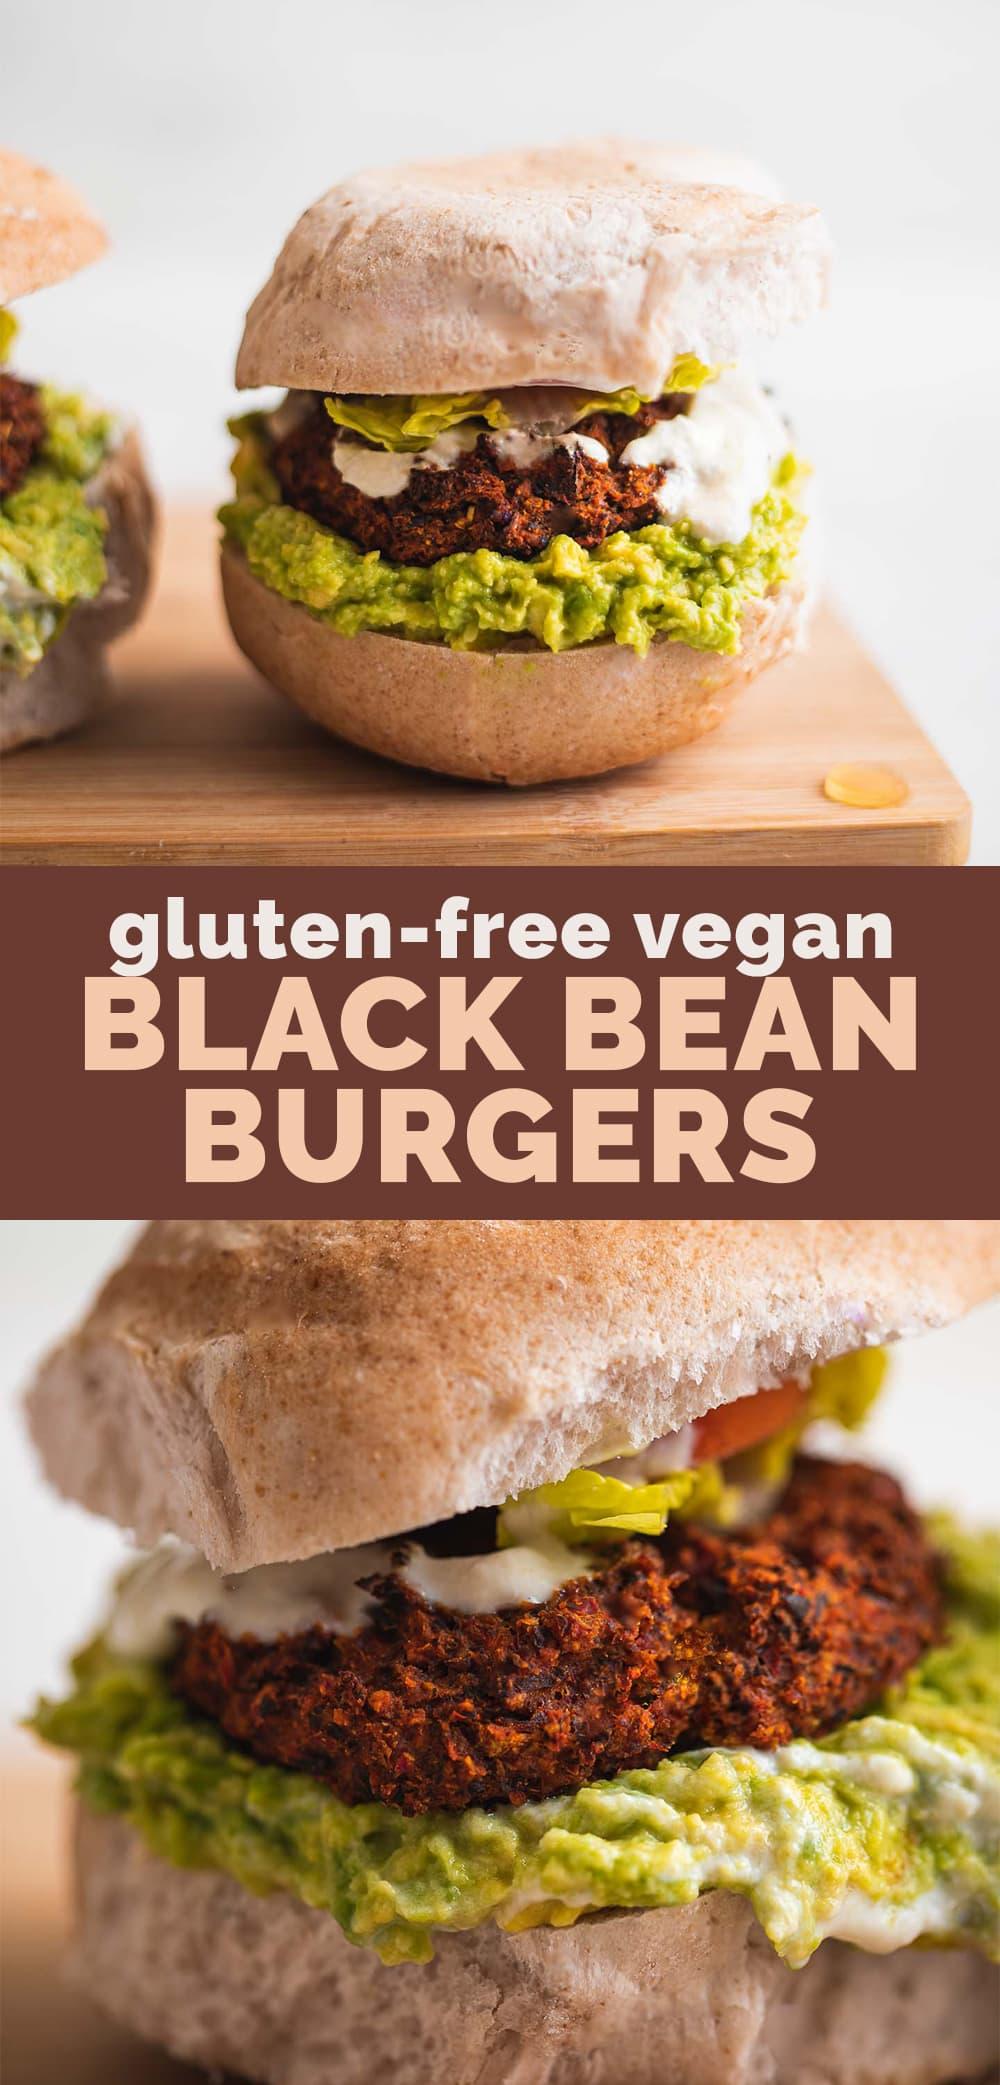 Gluten-free vegan black bean burgers